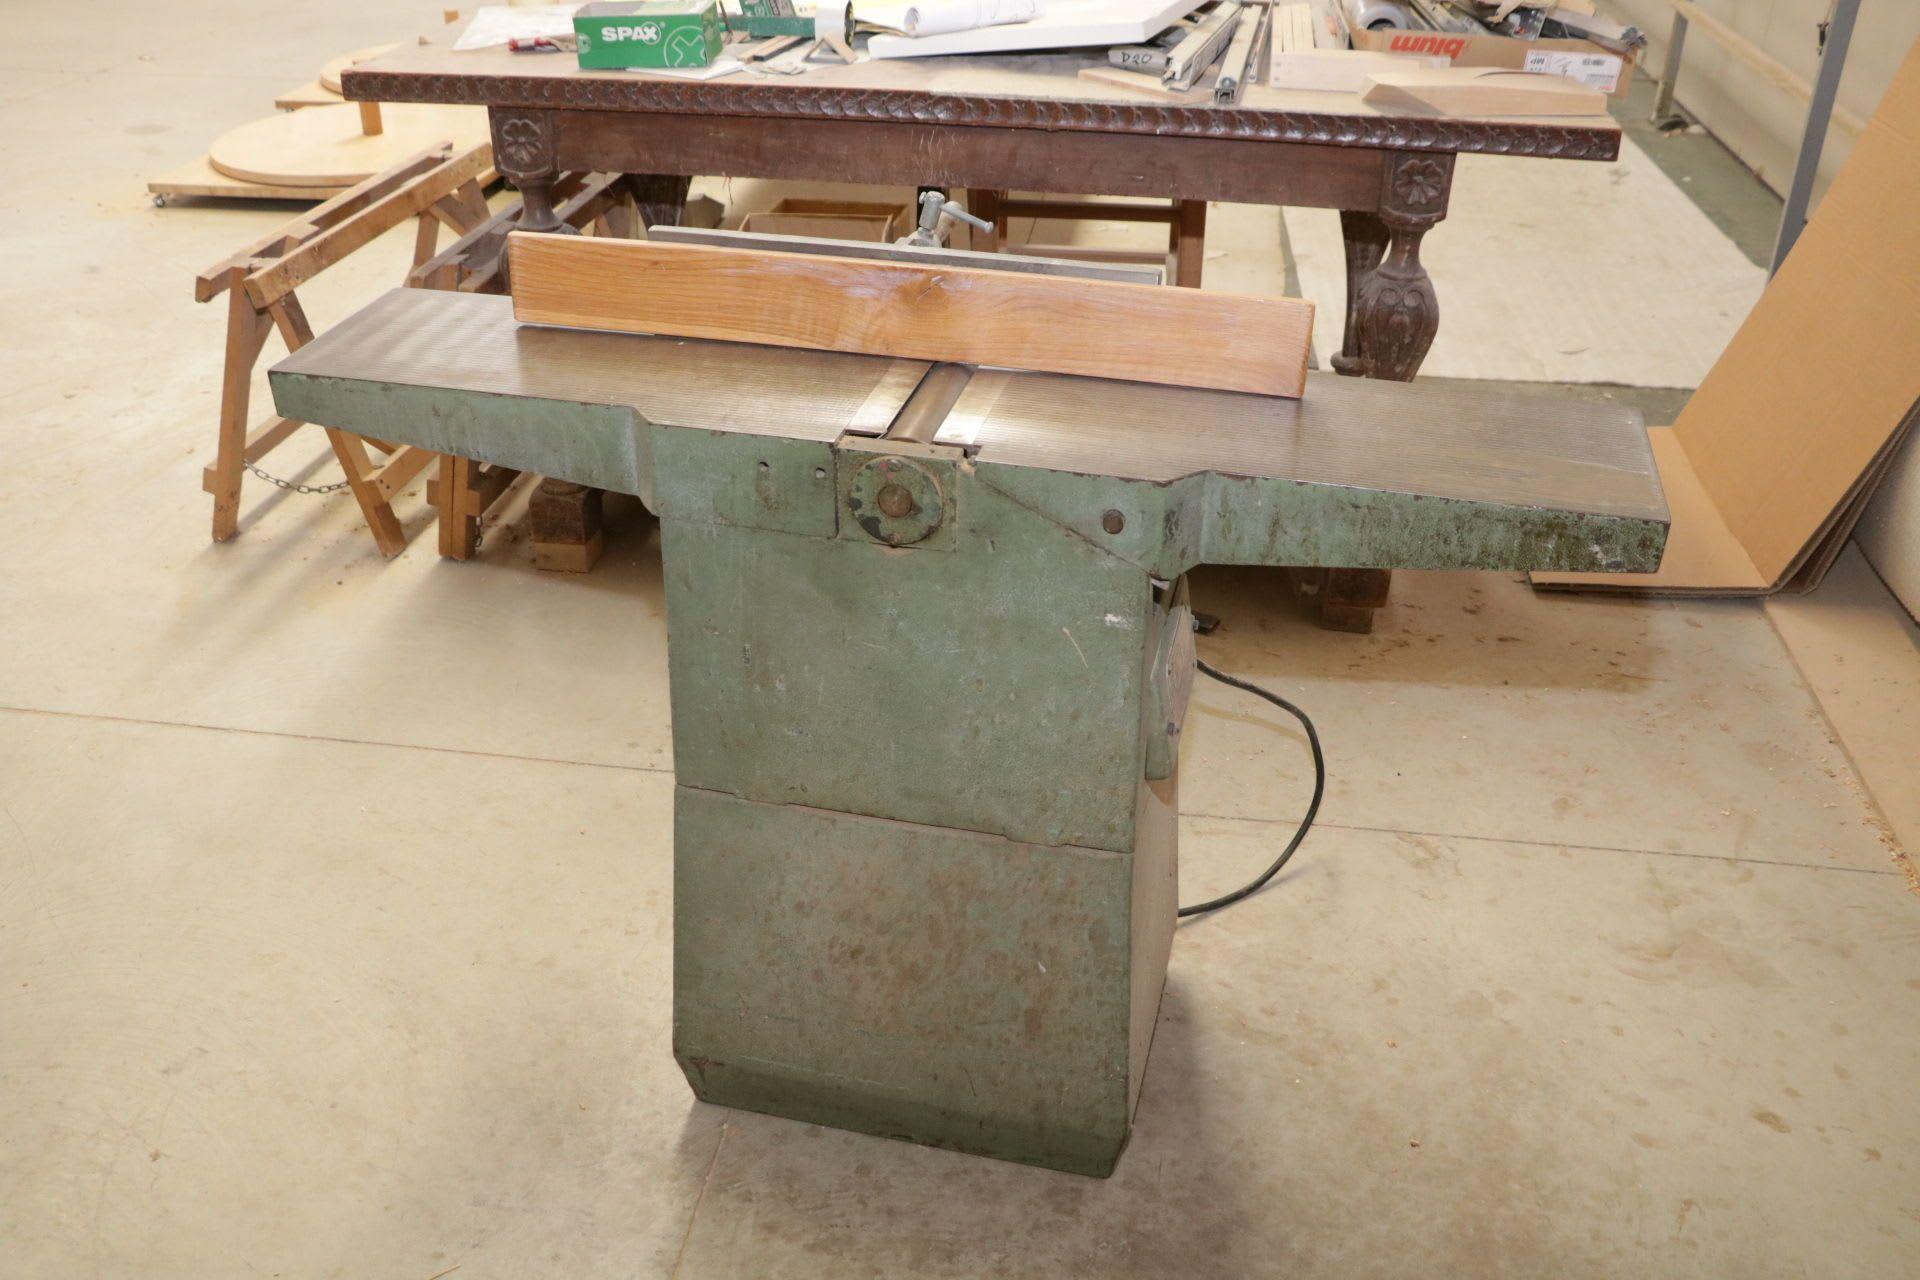 GMC 250 Abrichthobelmaschine